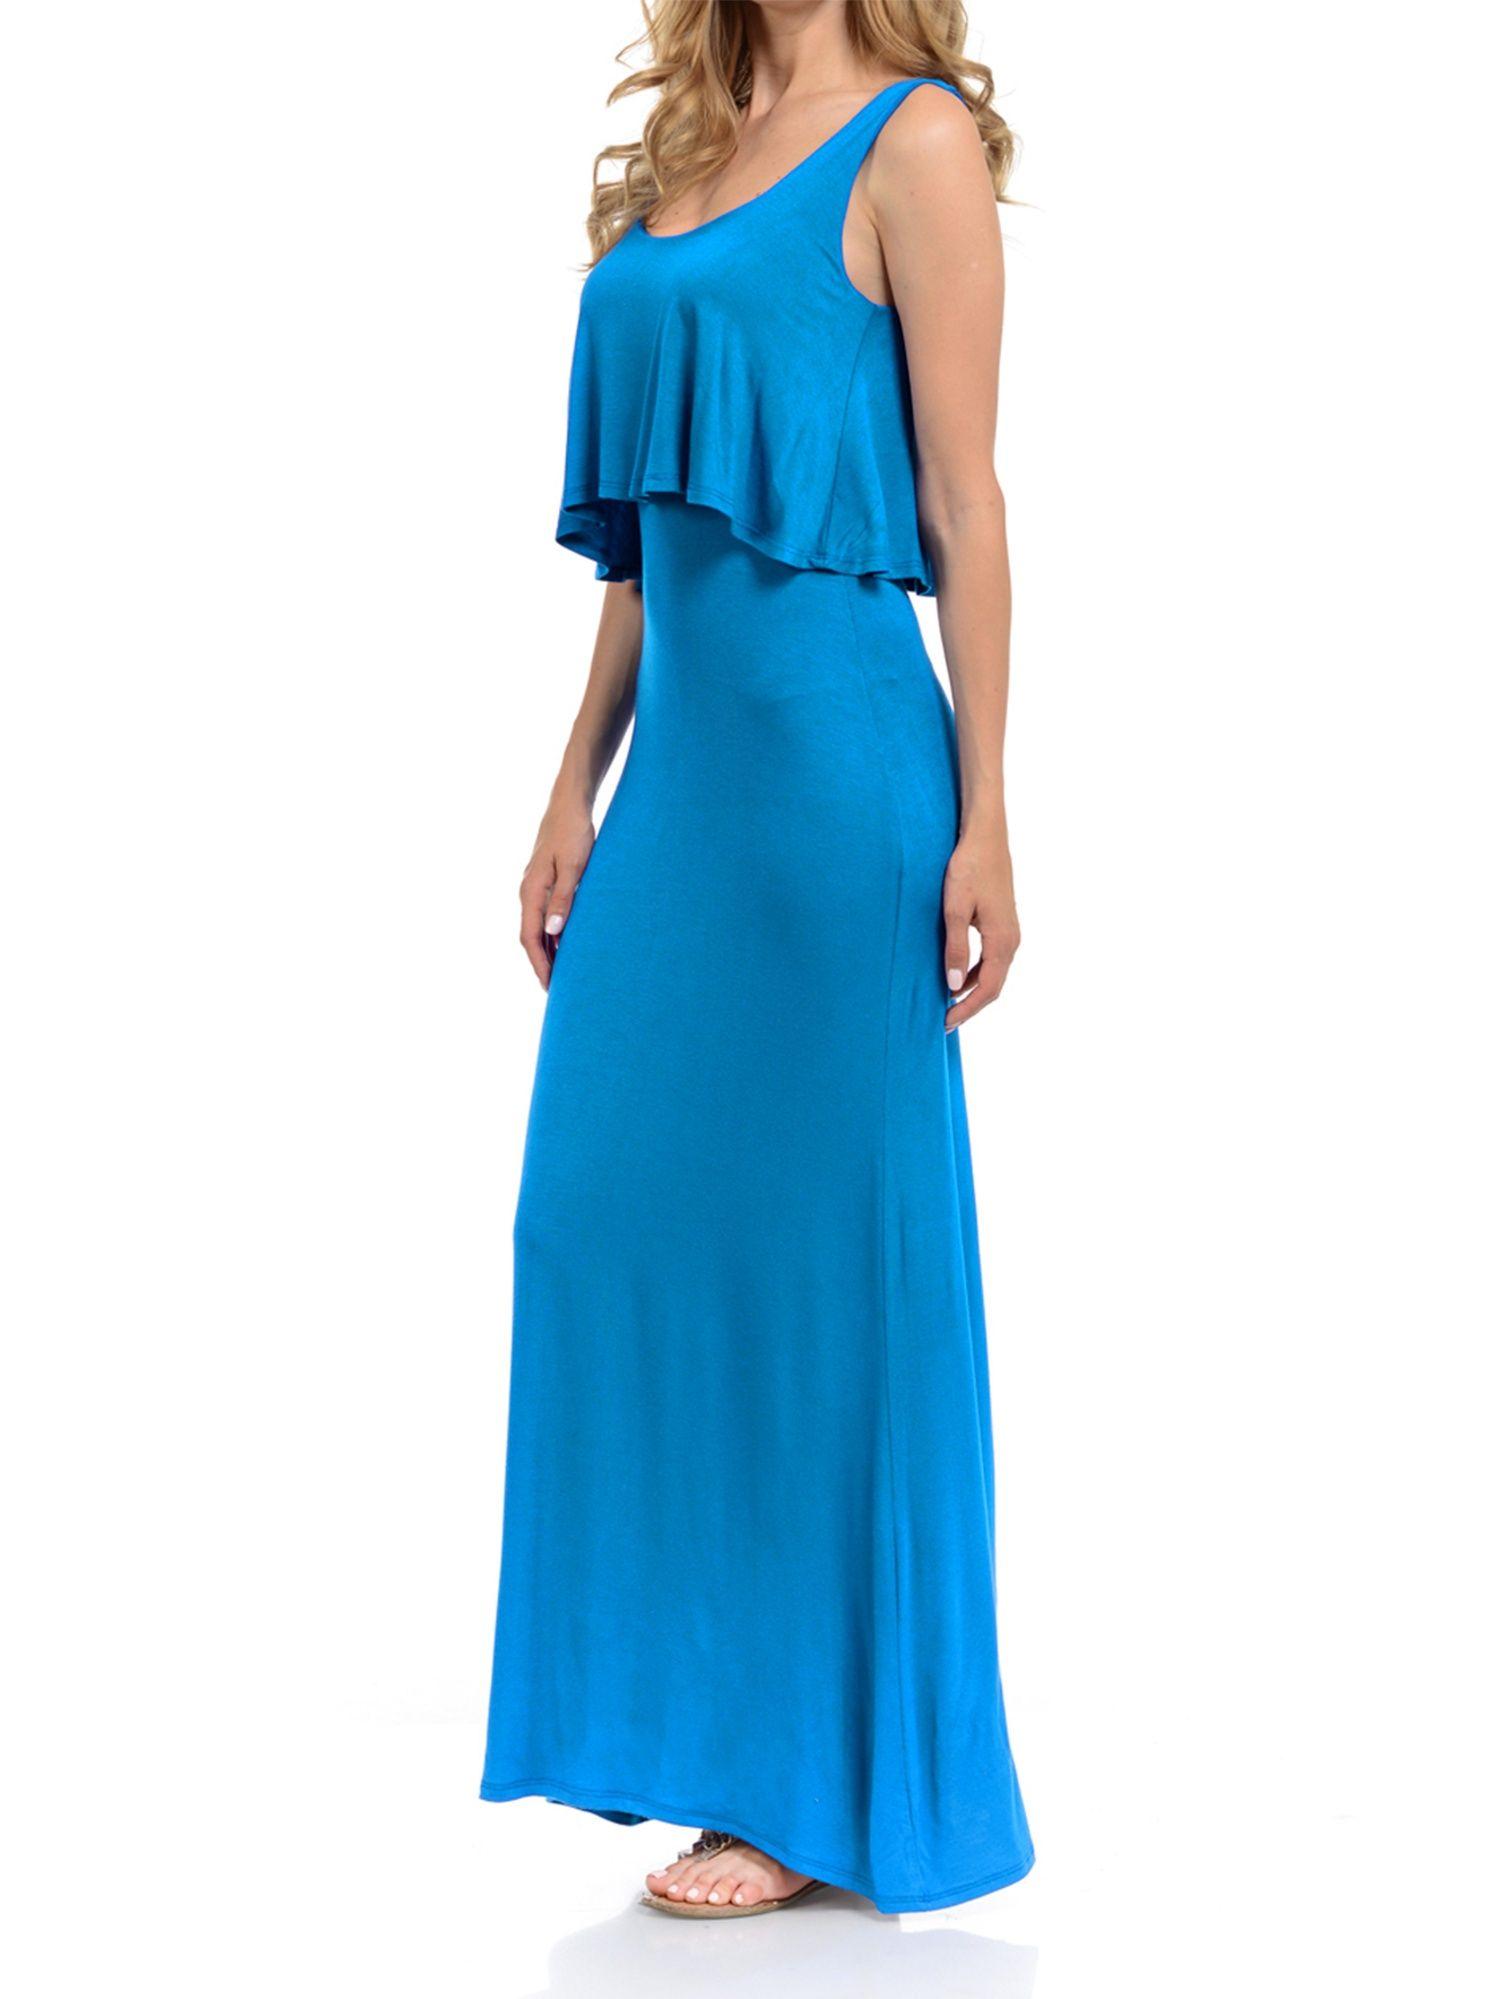 Basico Basico Women S Maxi Dress Sleeveless Tube Top Walmart Com Womens Maxi Dresses Sleeveless Tube Top Maxi Dress [ 1999 x 1500 Pixel ]